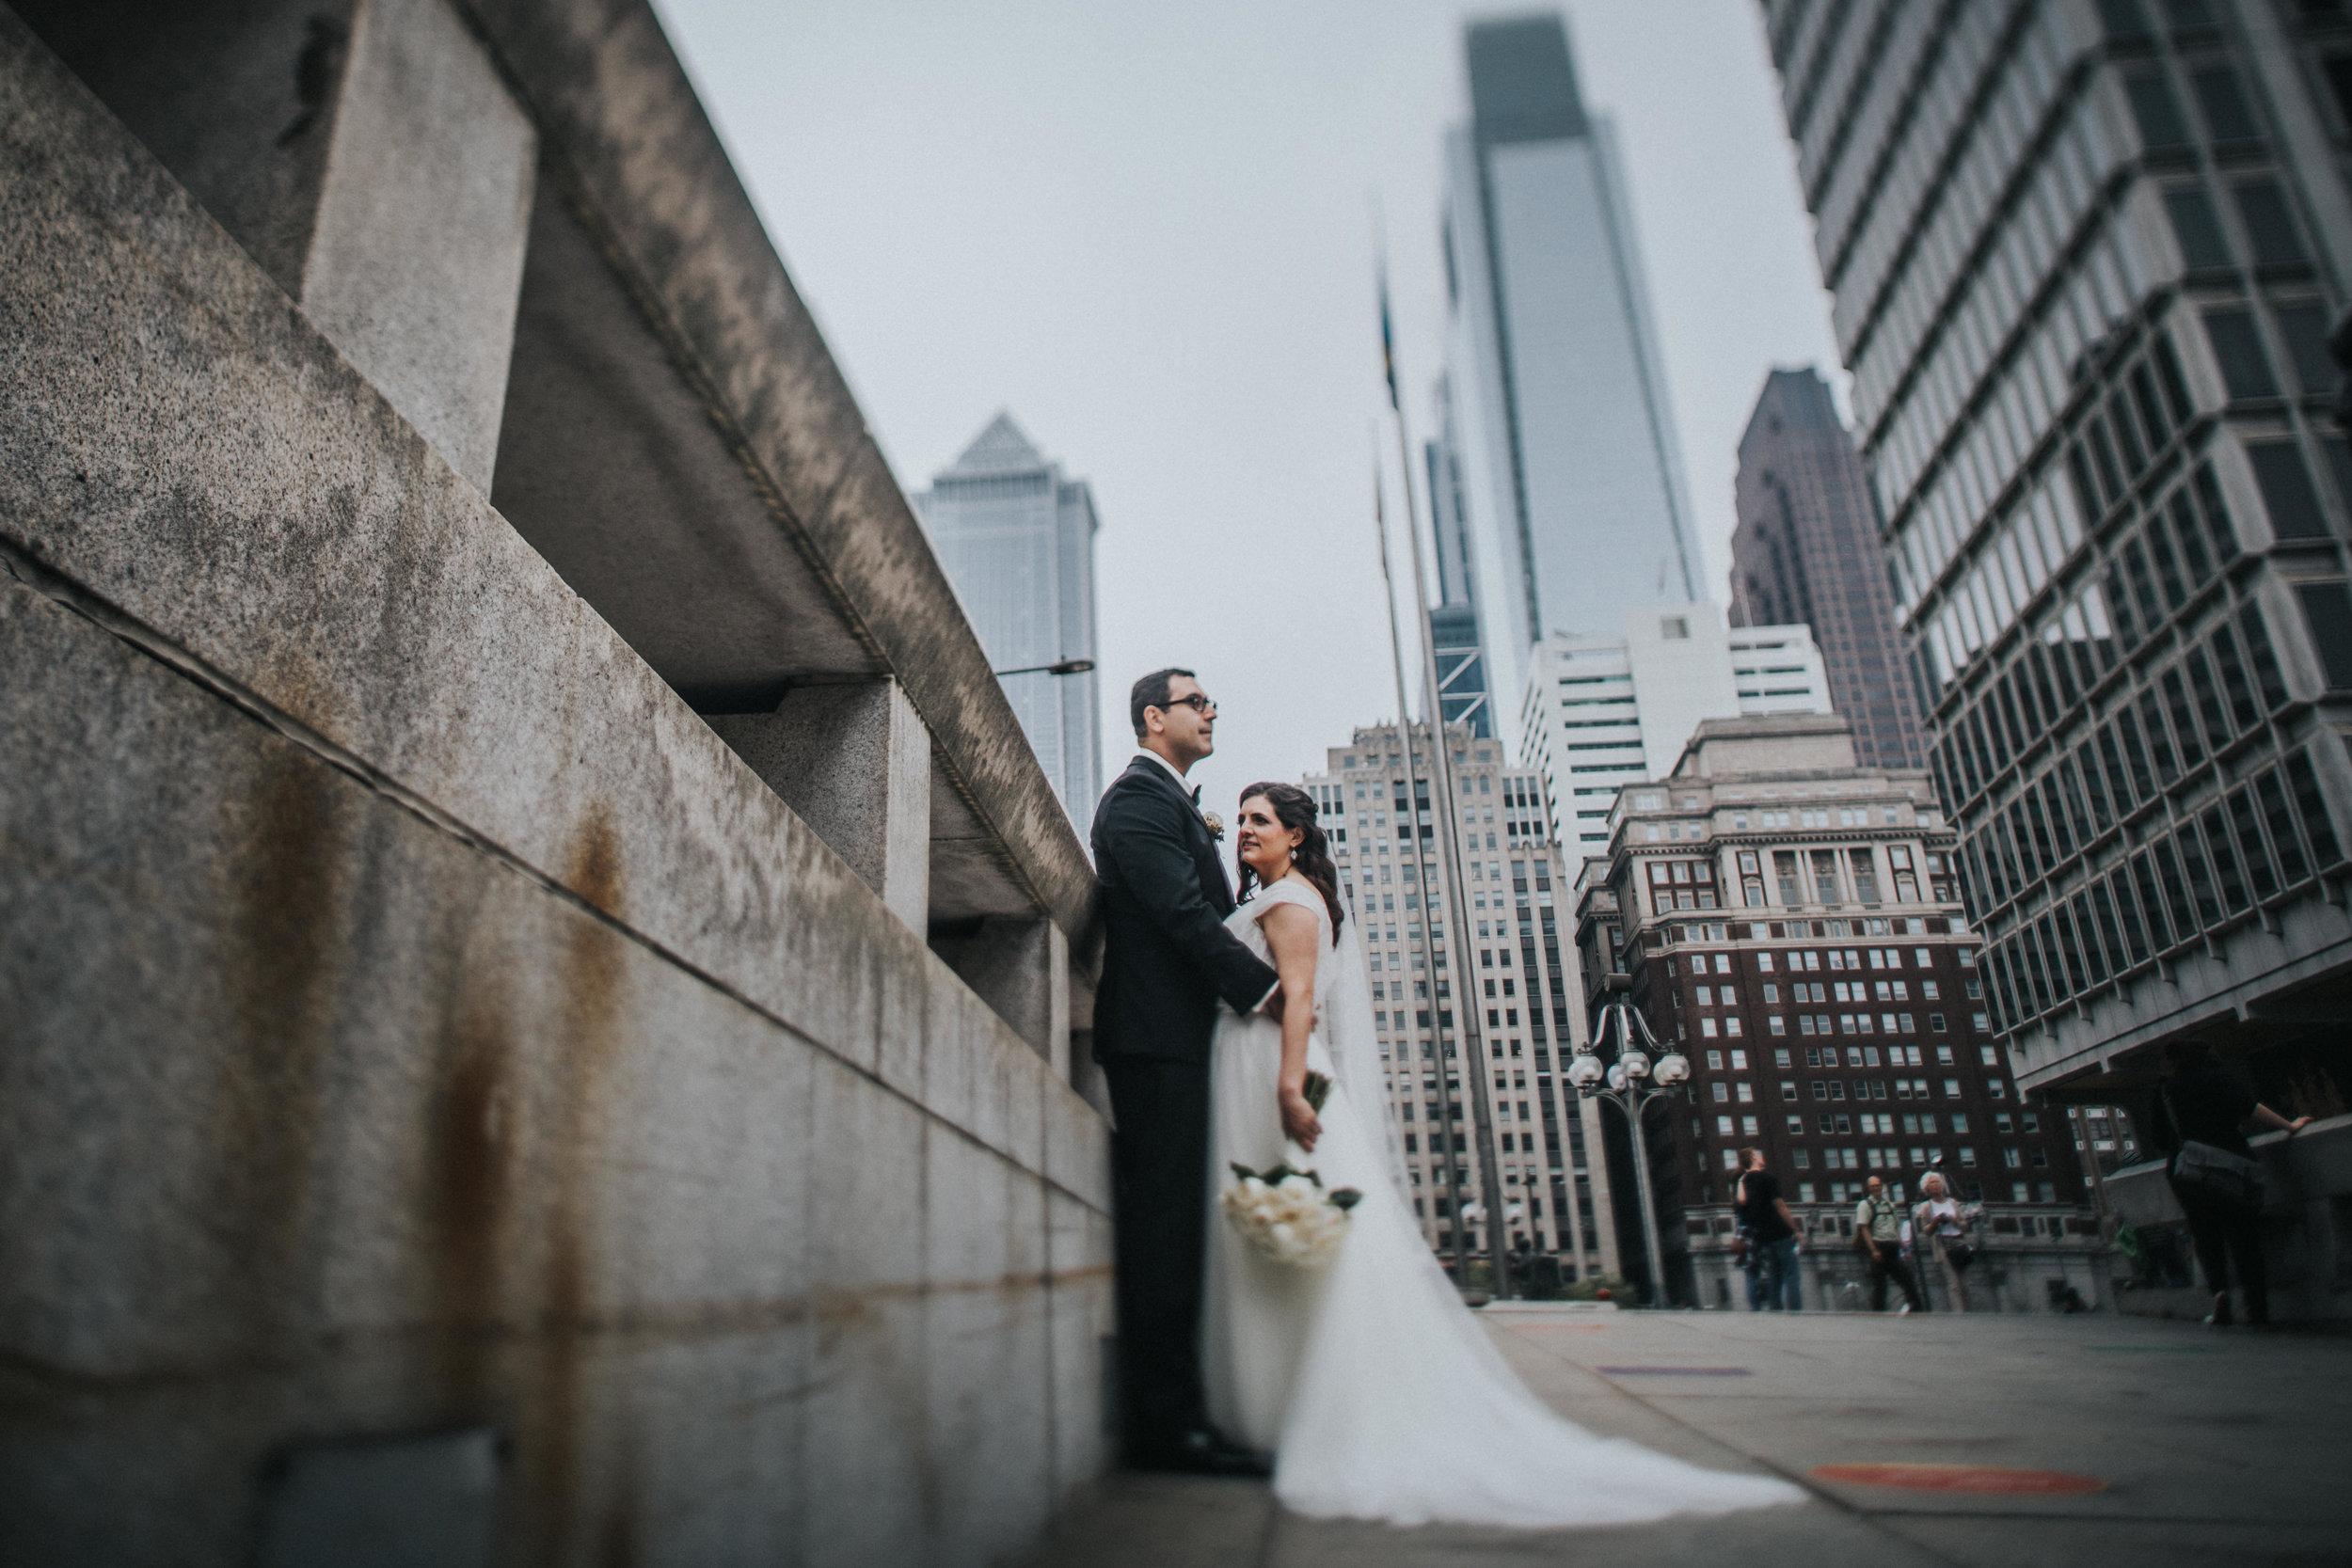 JennaLynnPhotography-NJWeddingPhotographer-Philadelphia-Wedding-ArtsBallroom-BridalParty-35.jpg